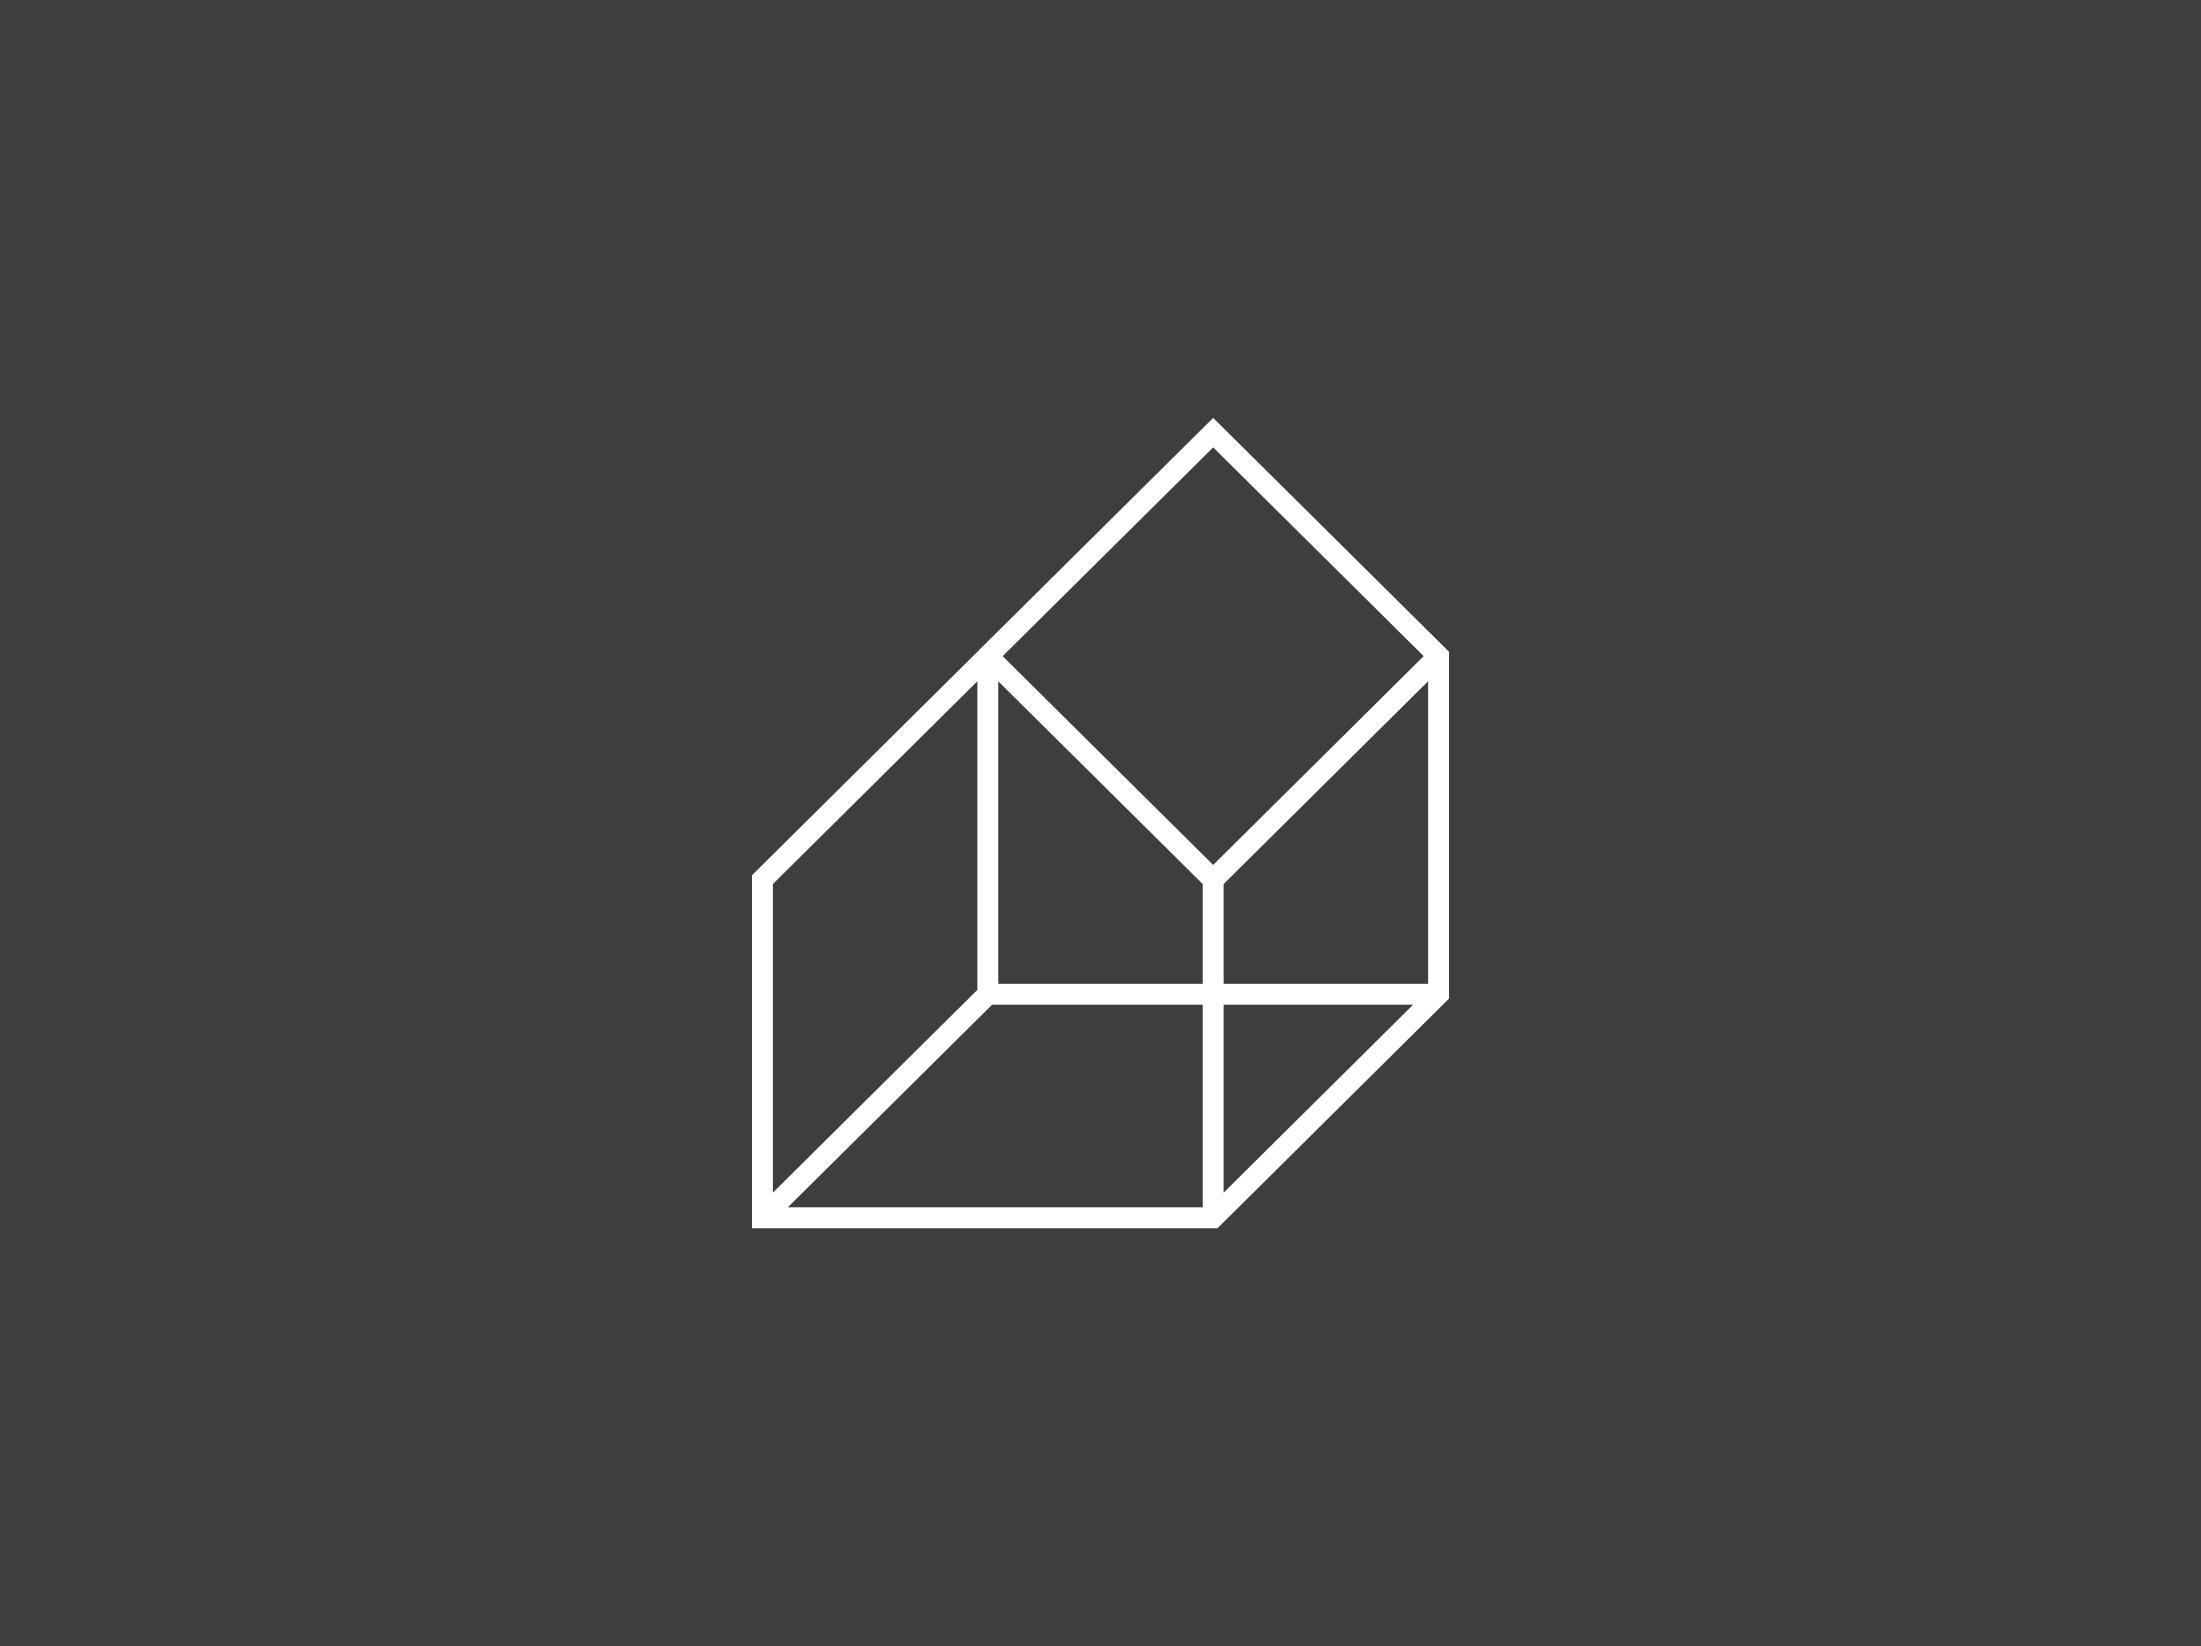 Master-Passivhaus-Burgos-1.png